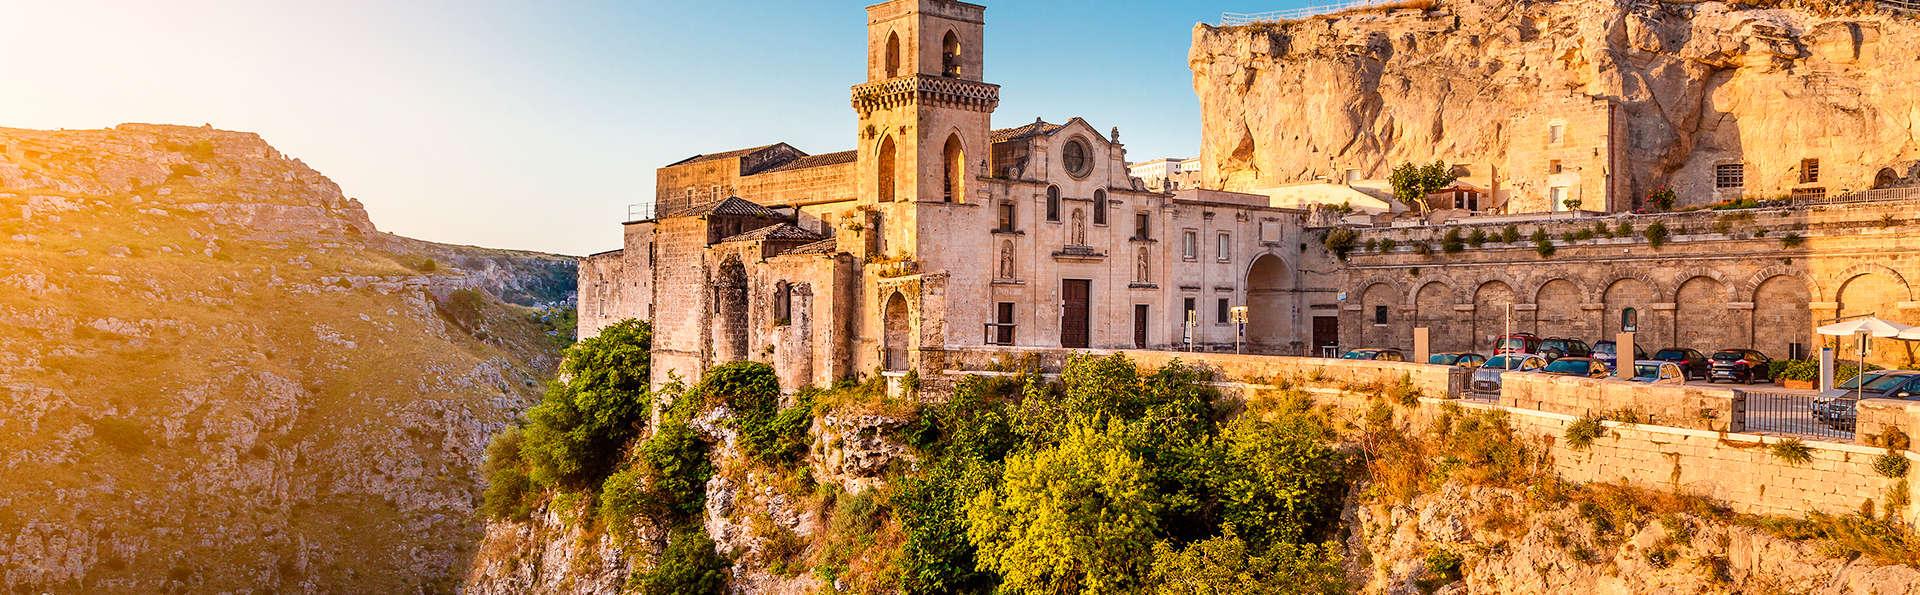 Dimora Tre Cancelli - EDIT_destination4.jpg